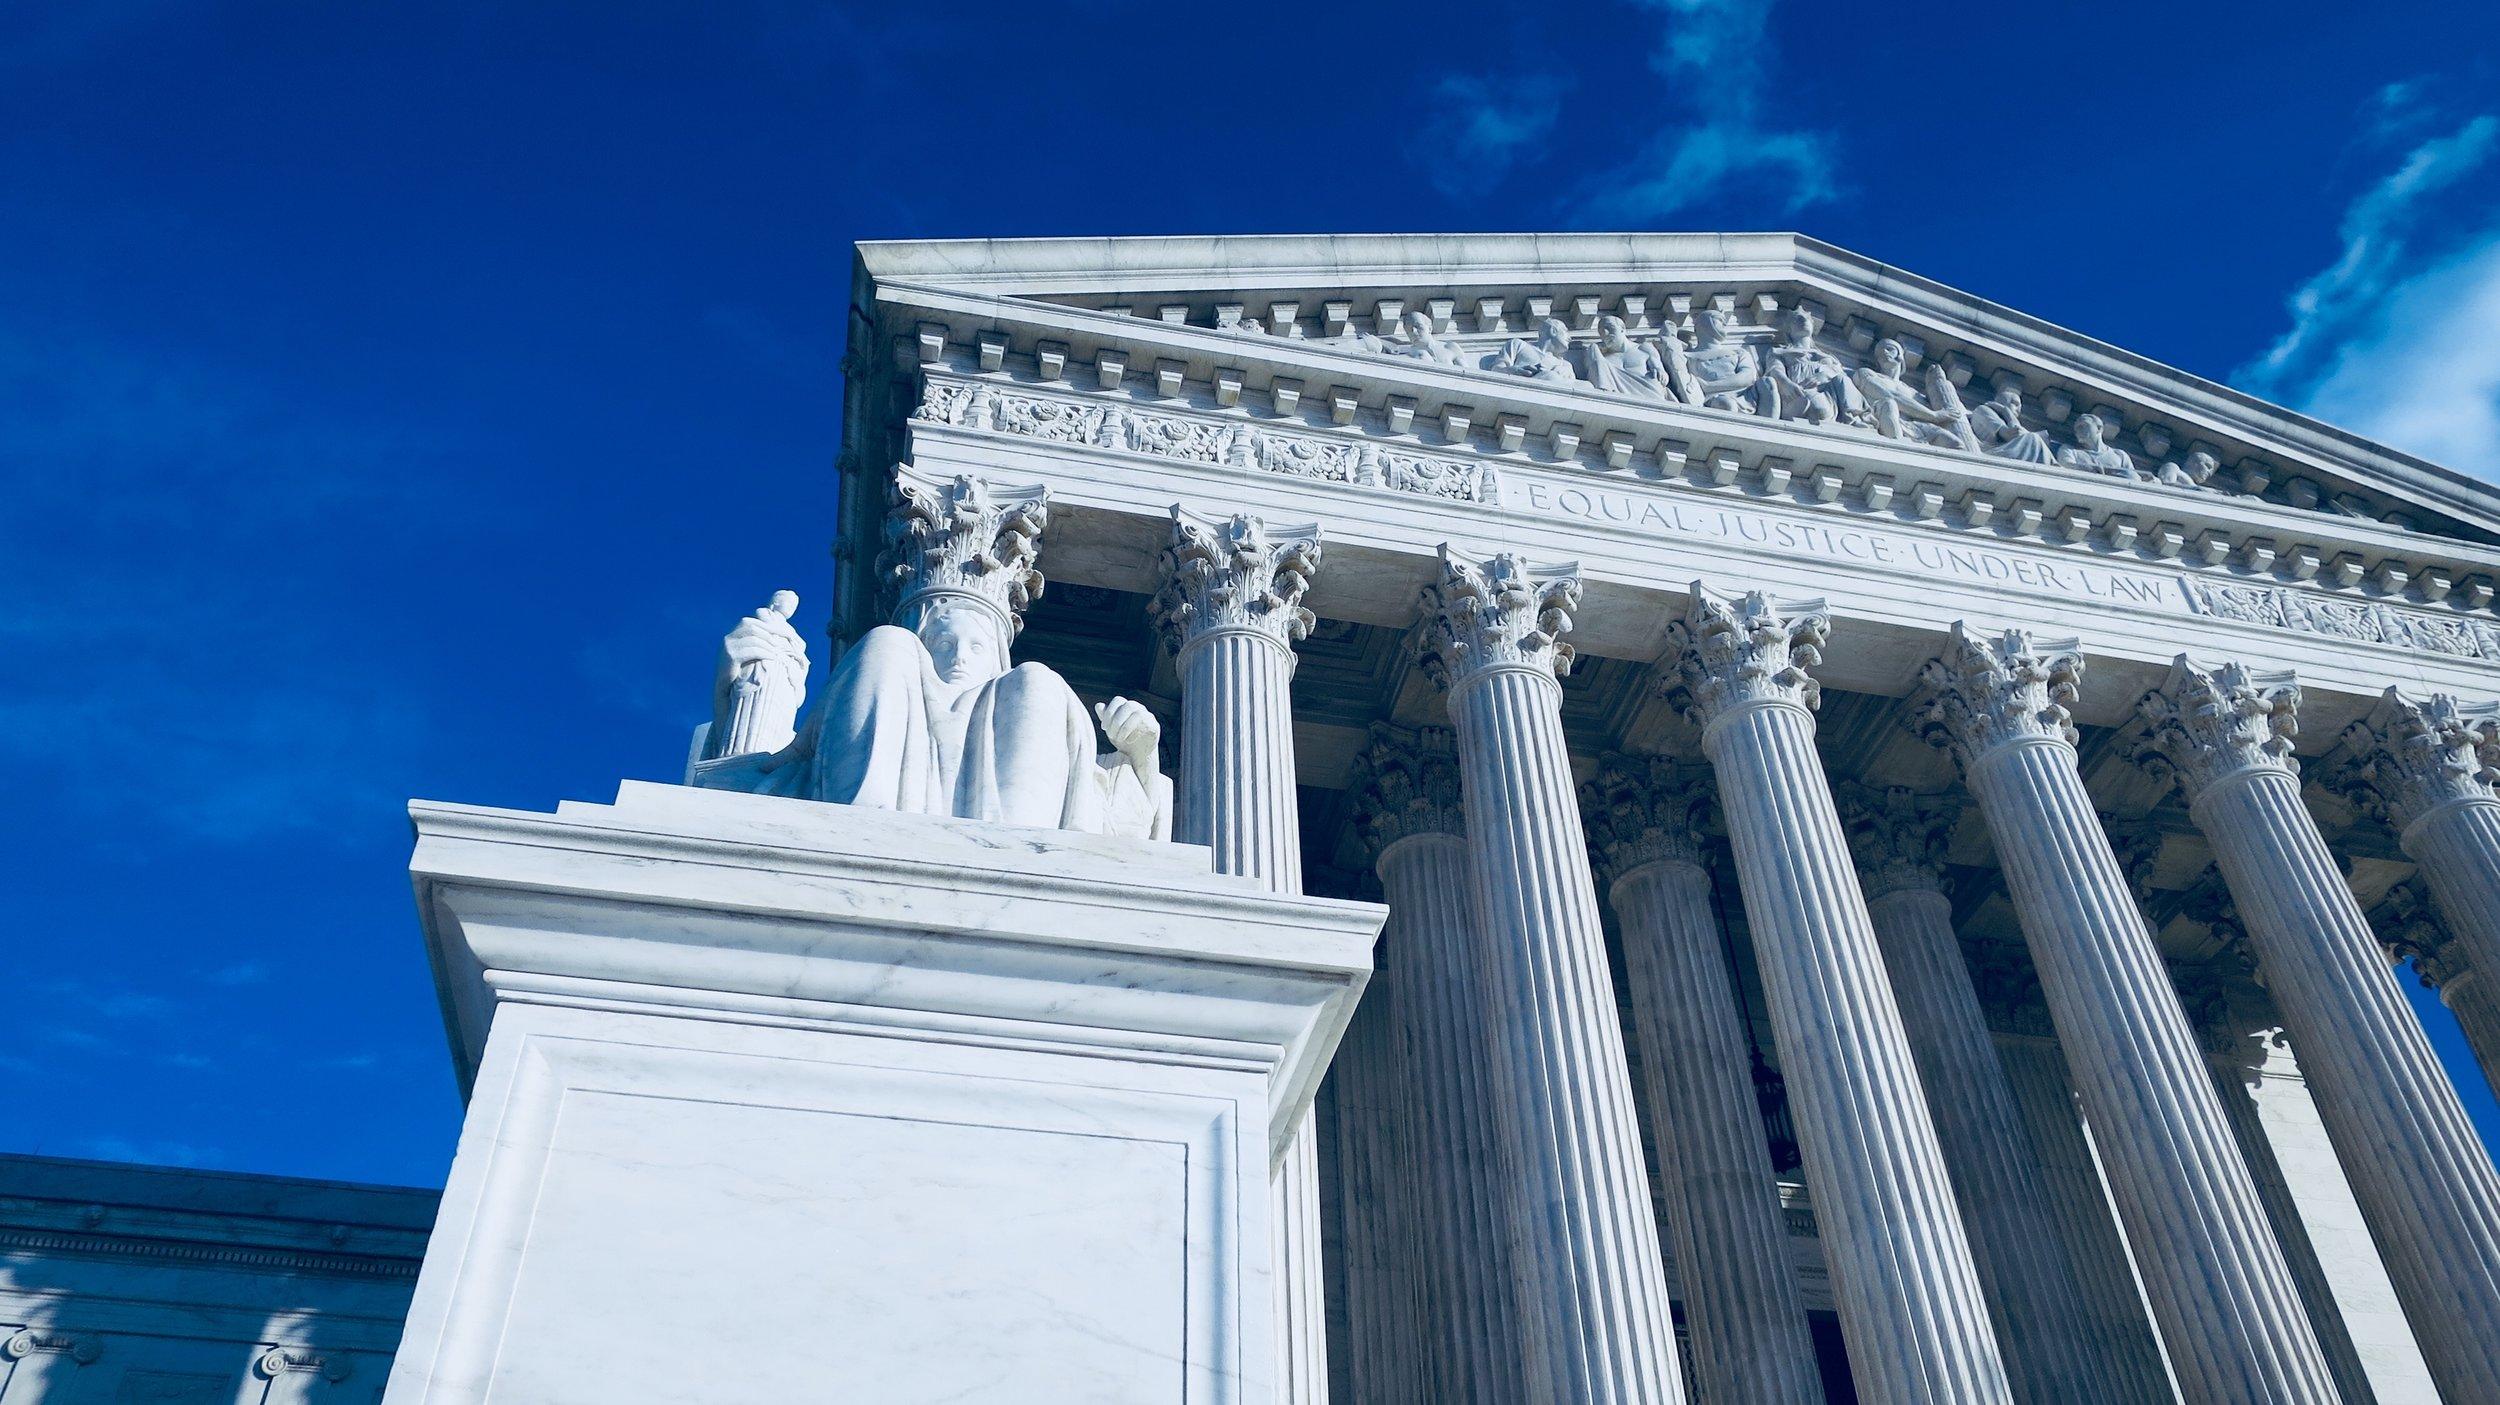 registration-of-scandalous-marks-supreme-court.jpg